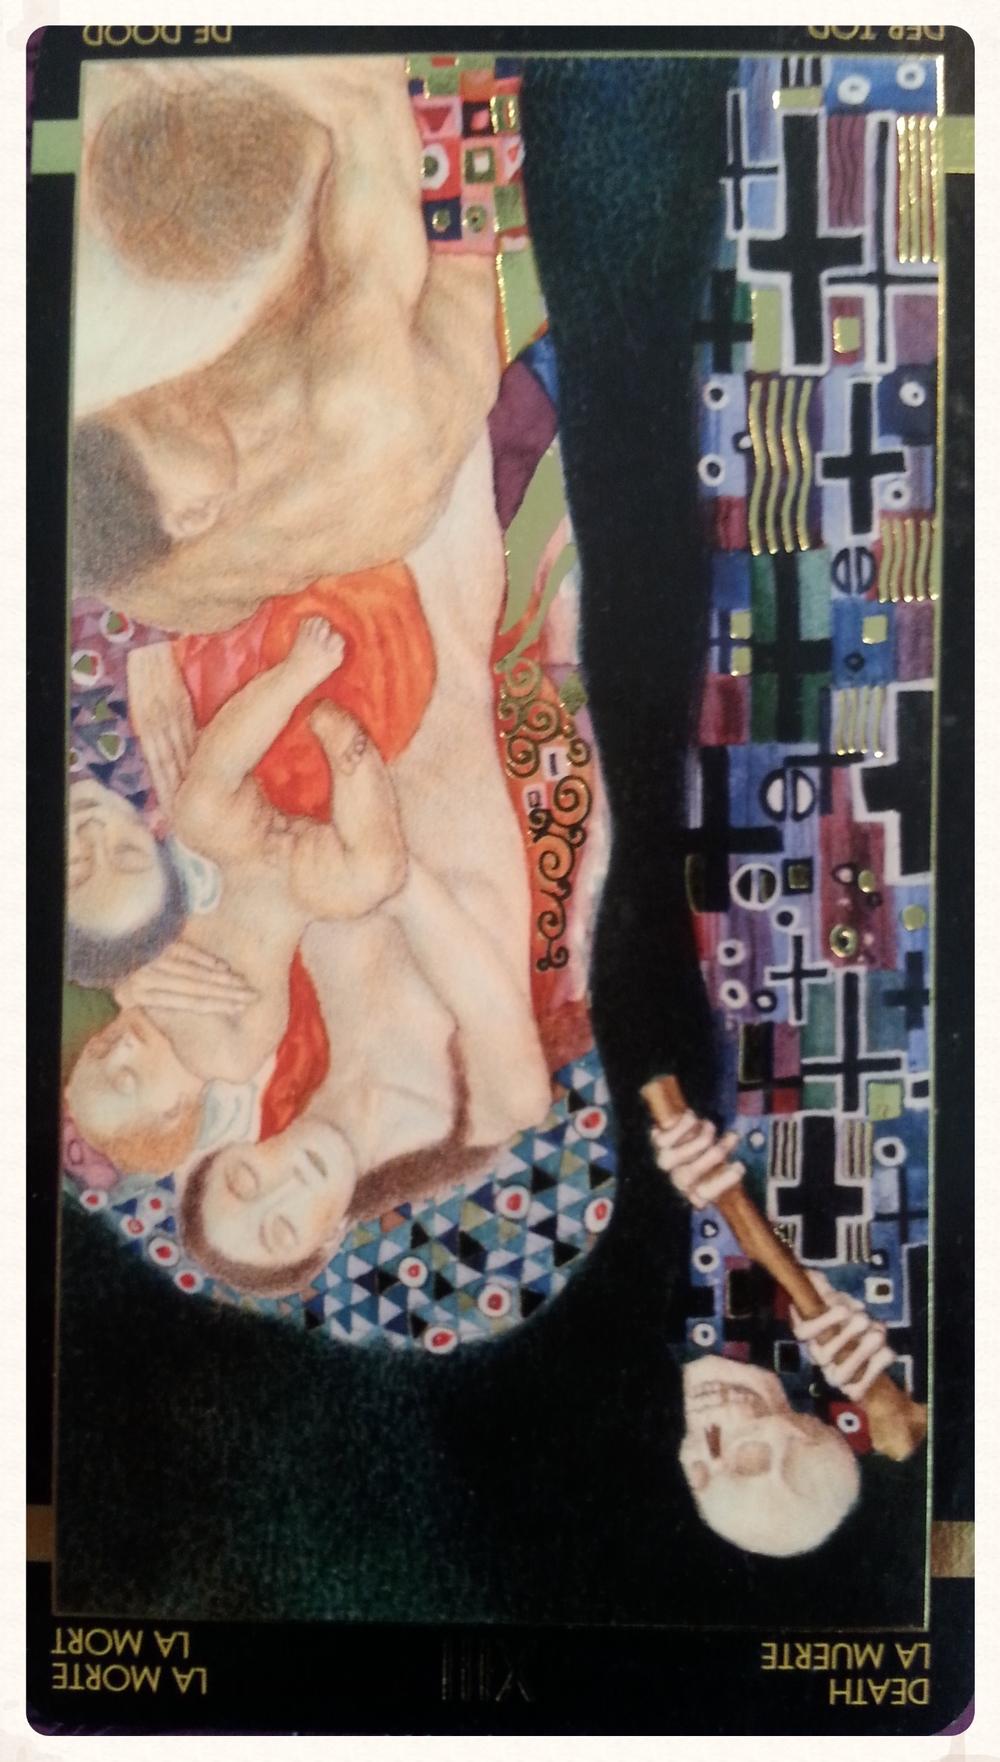 TYR'S-DAY SEPTEMBER 29TH 2015-MAJOR ARCANA- CARD 13- DEATH-REVERSED